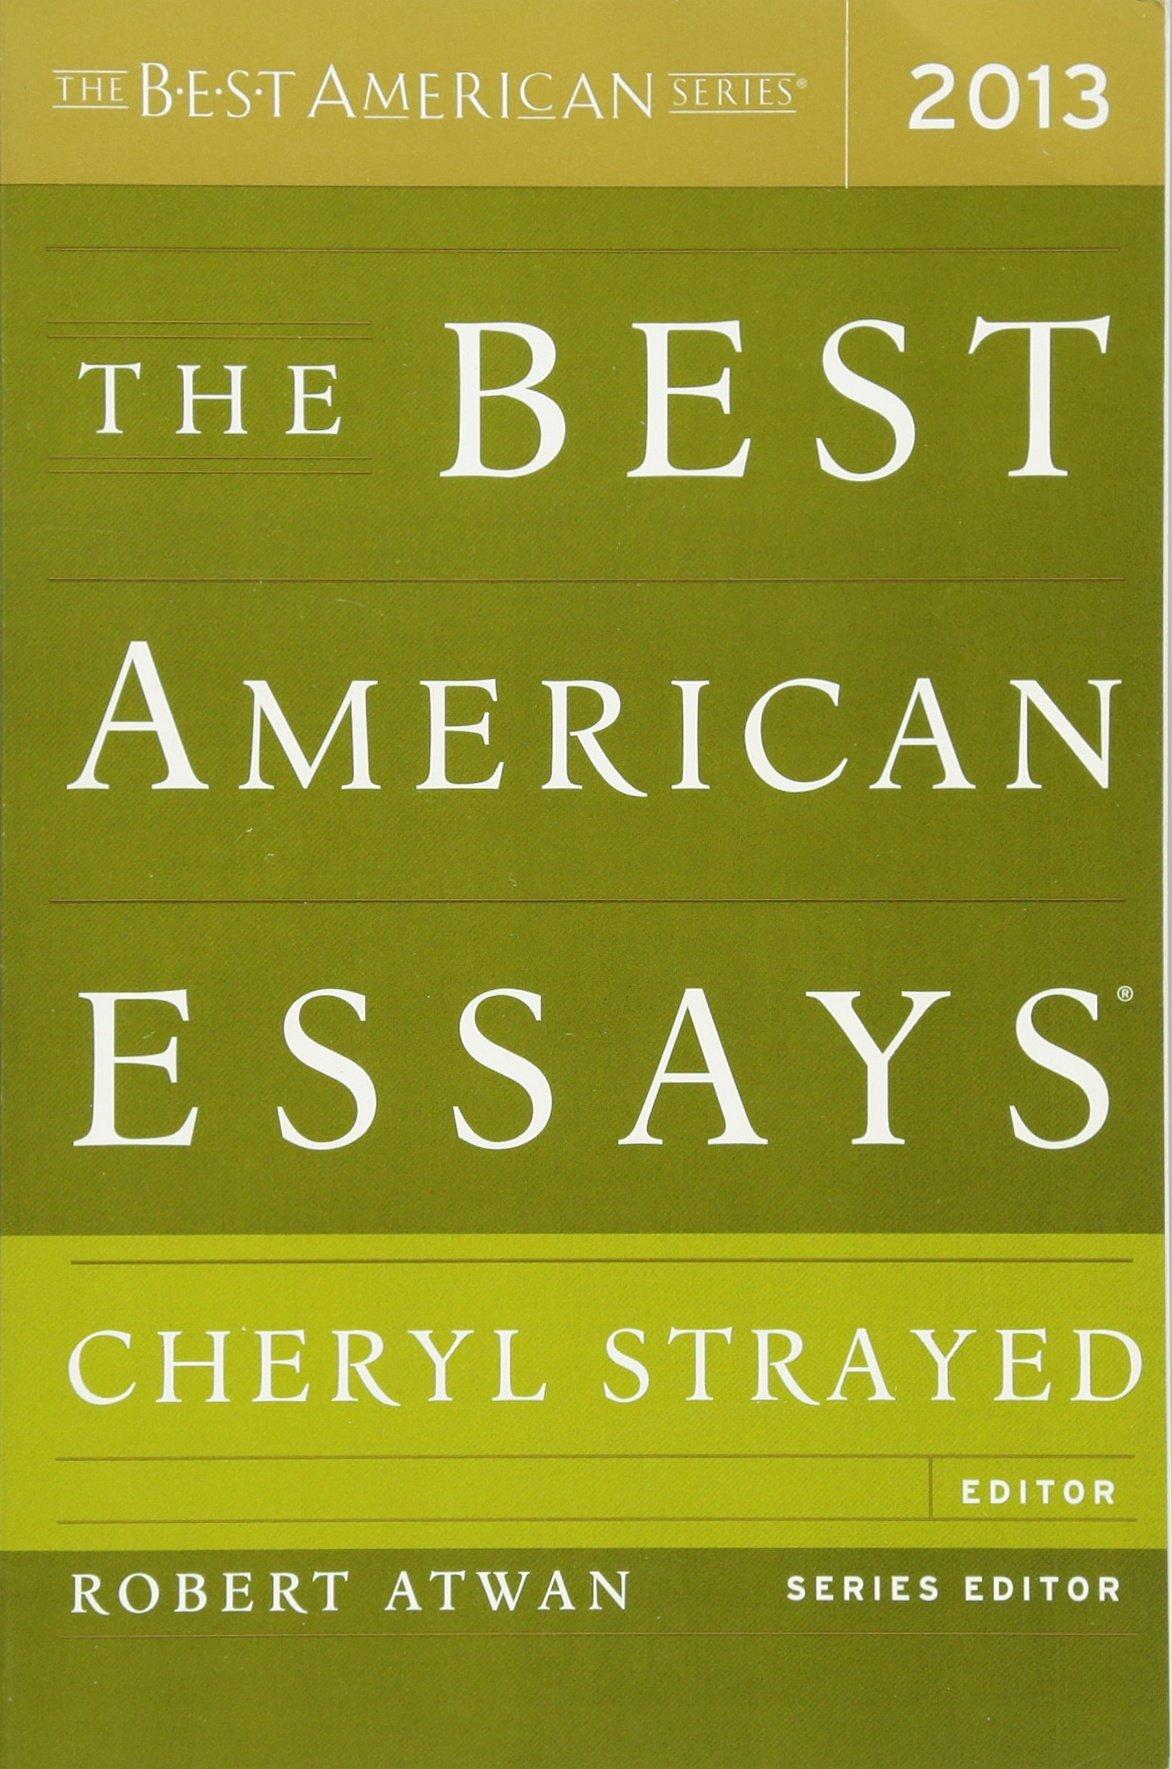 003 The Best American Essays 81nkls2j9vl Essay Wonderful 2018 Pdf 2017 Table Of Contents 2015 Free Full